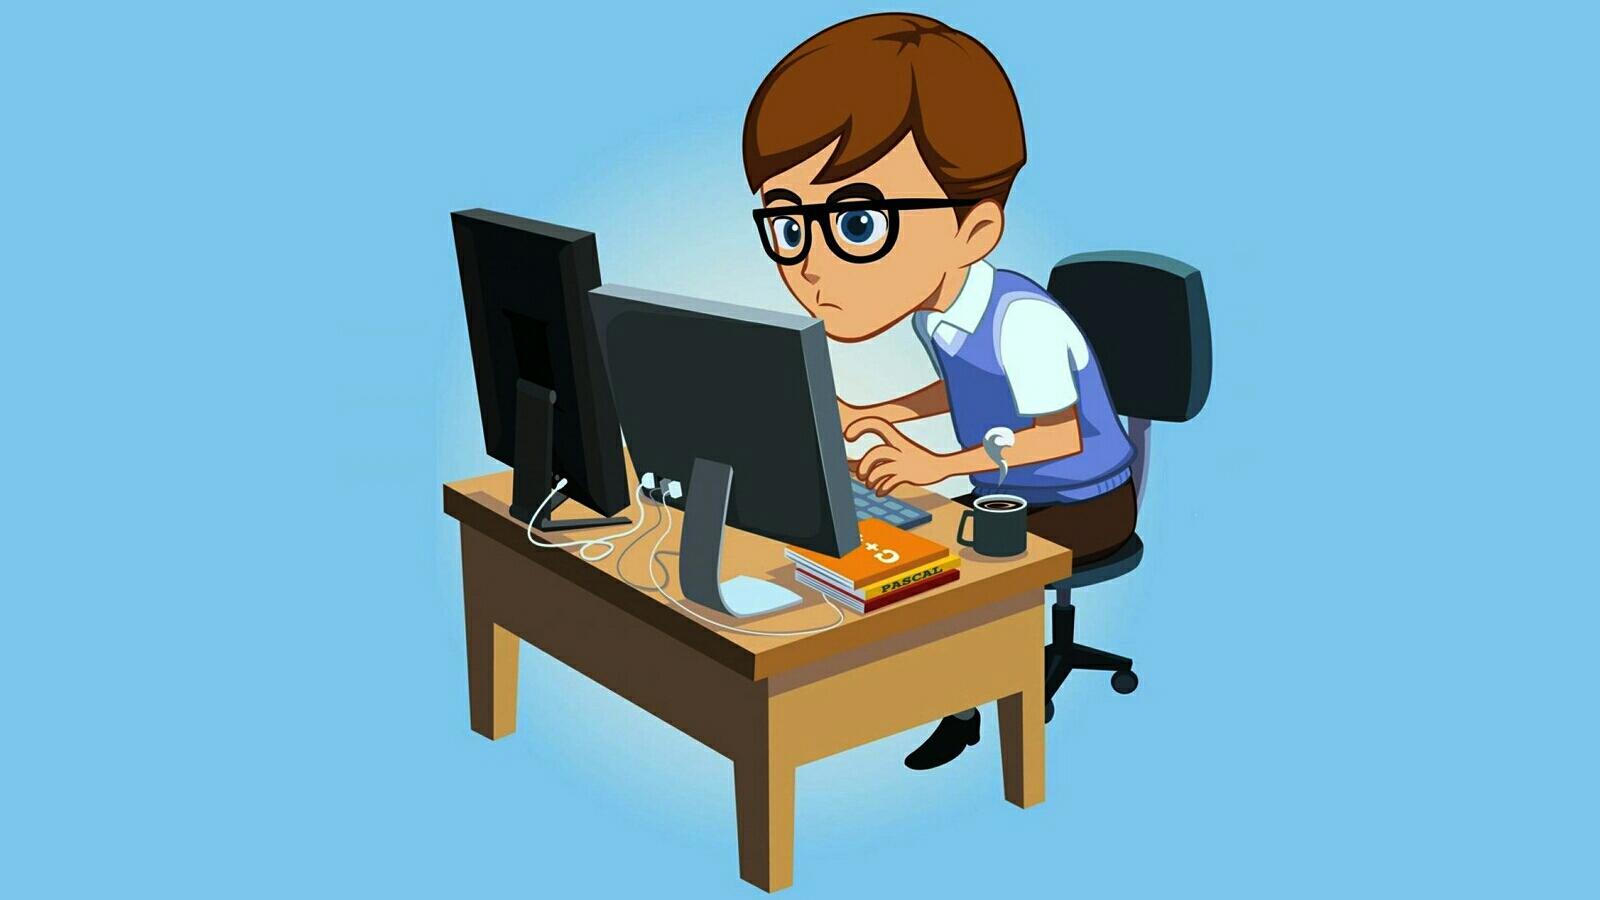 Картинка программиста для детей